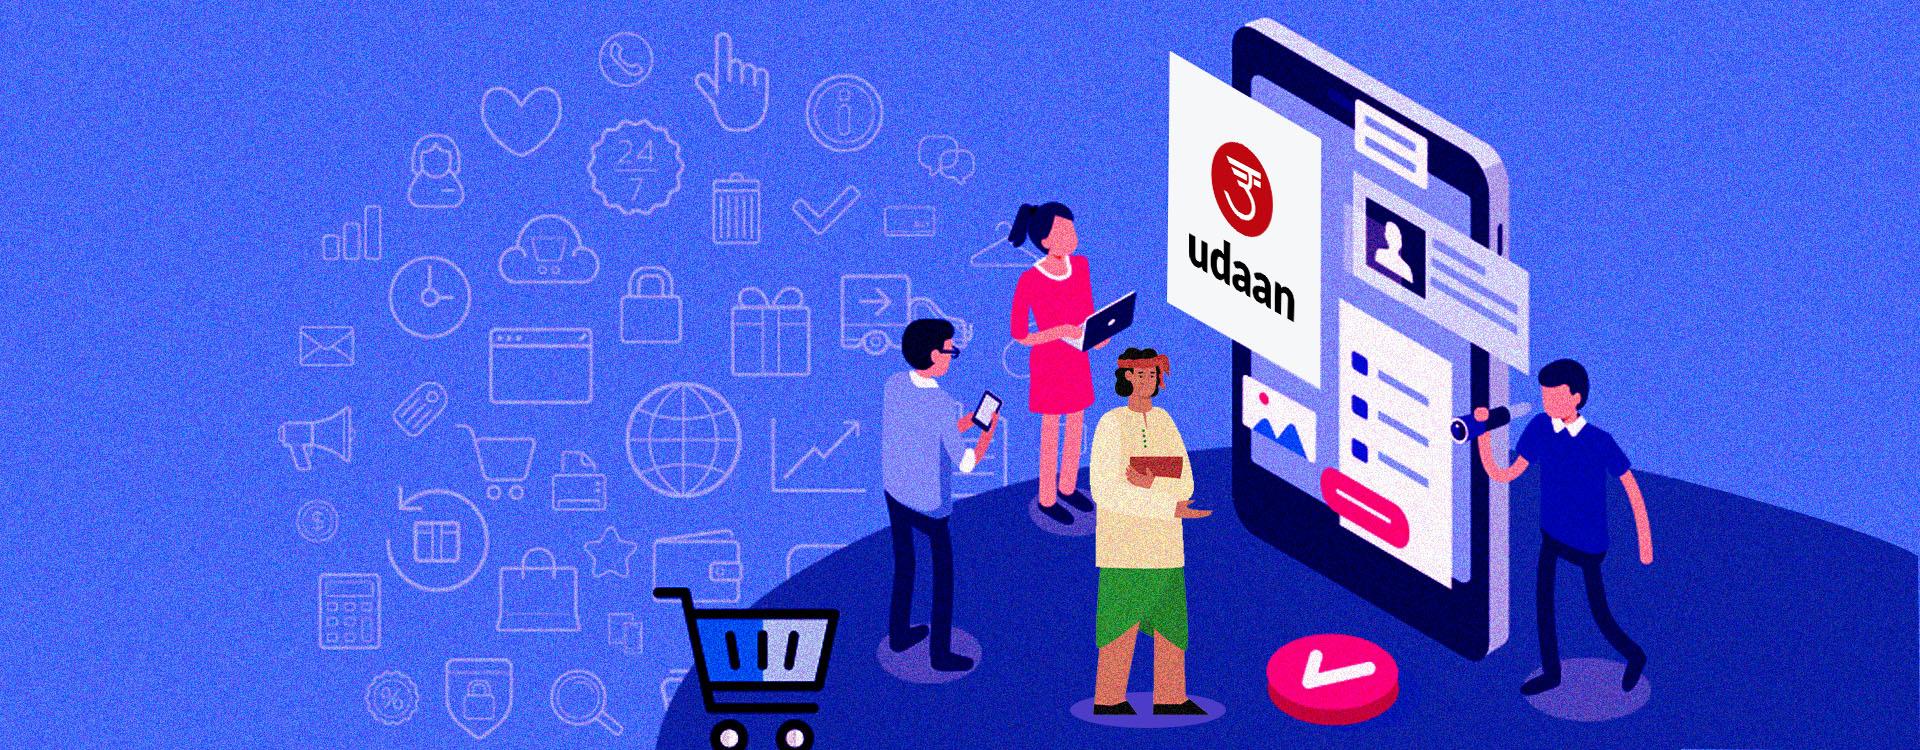 Growth story of B2B e-commerce platform Udaan